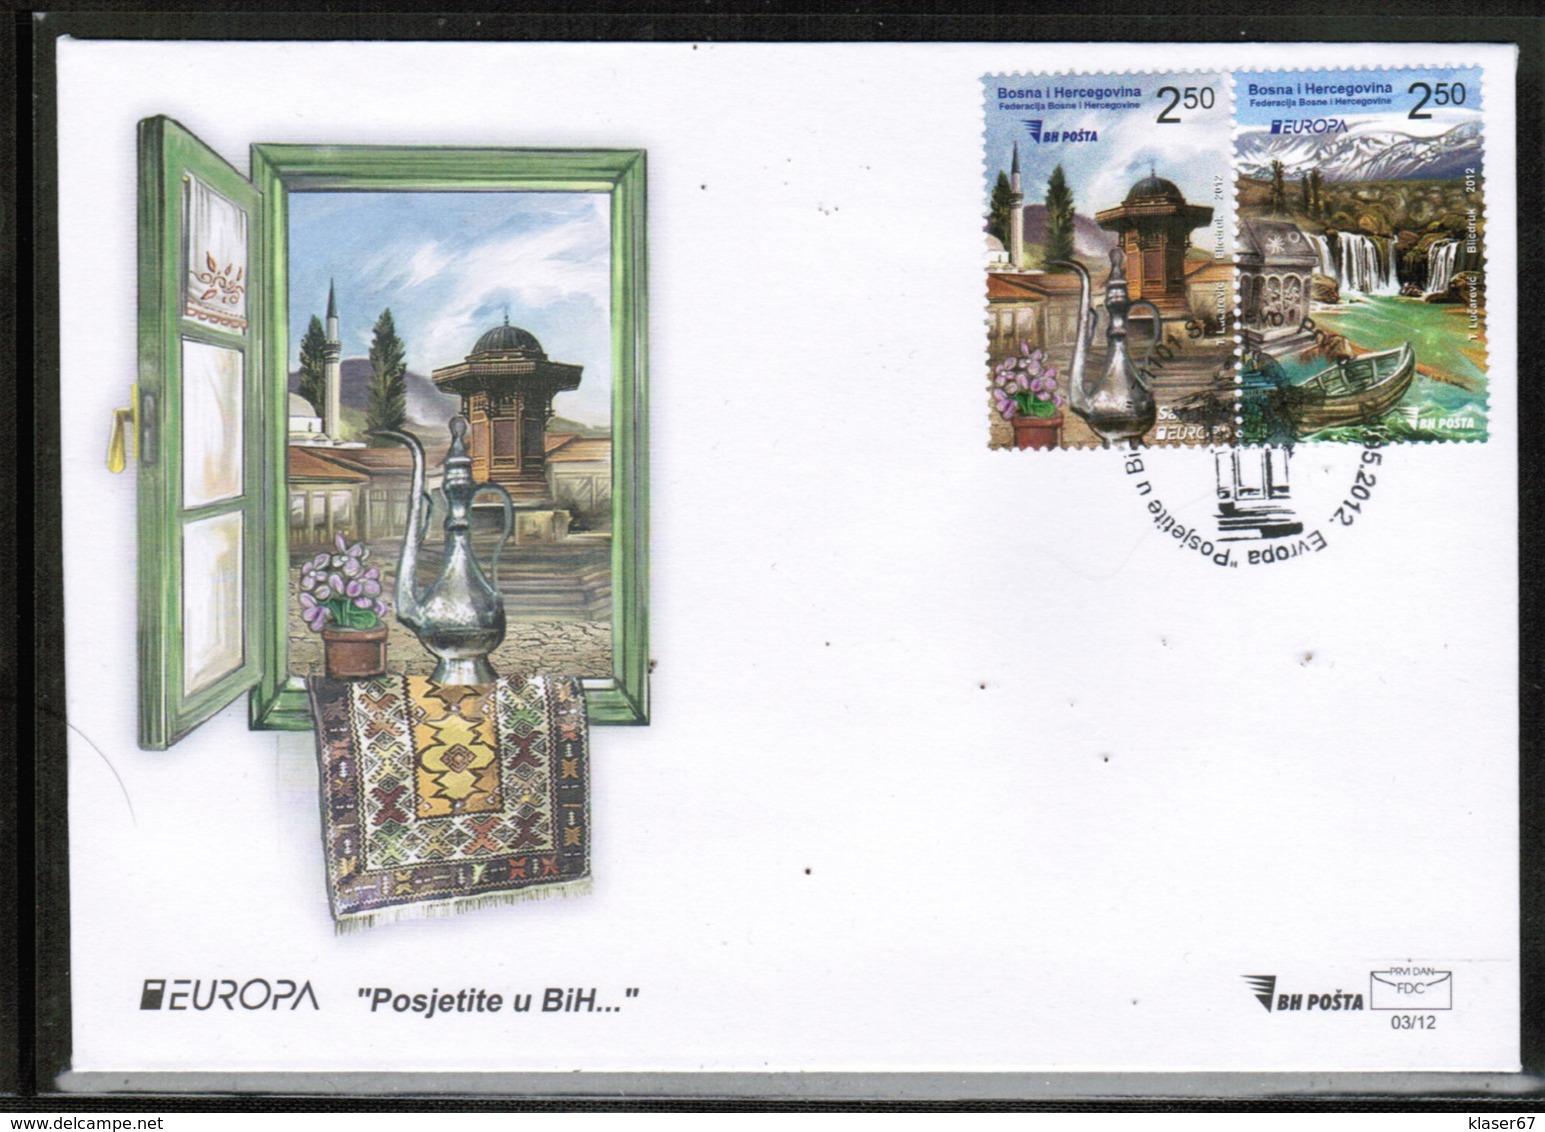 CEPT 2012 BA MI 589-90 BOSNIA AND HERZEGOVINA FDC - 2012